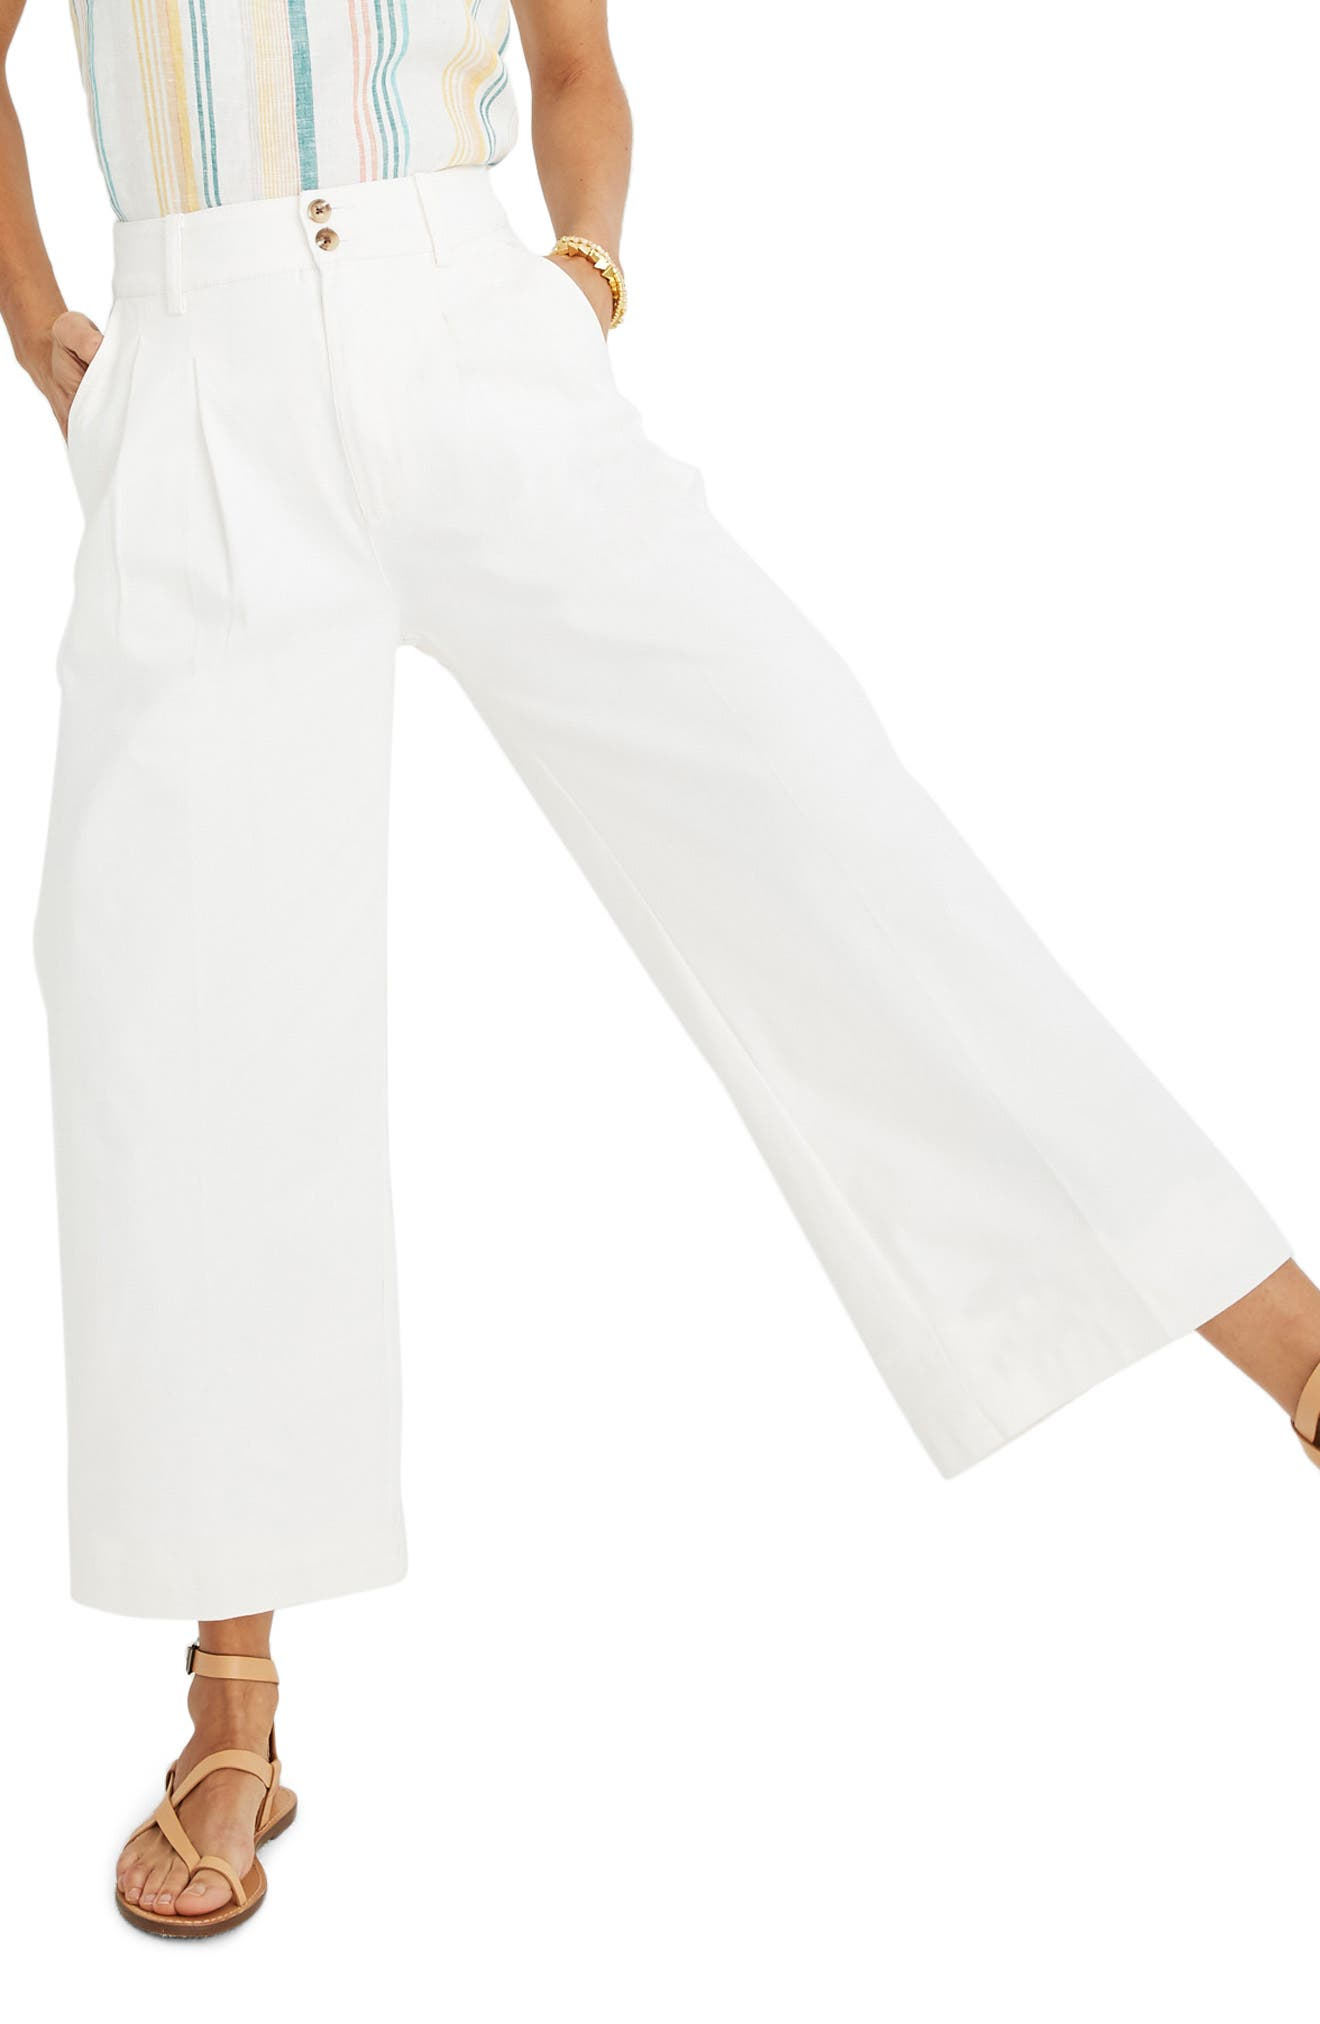 MADEWELL, High Waist Crop Wide Leg Pants, Main thumbnail 1, color, LIGHTHOUSE